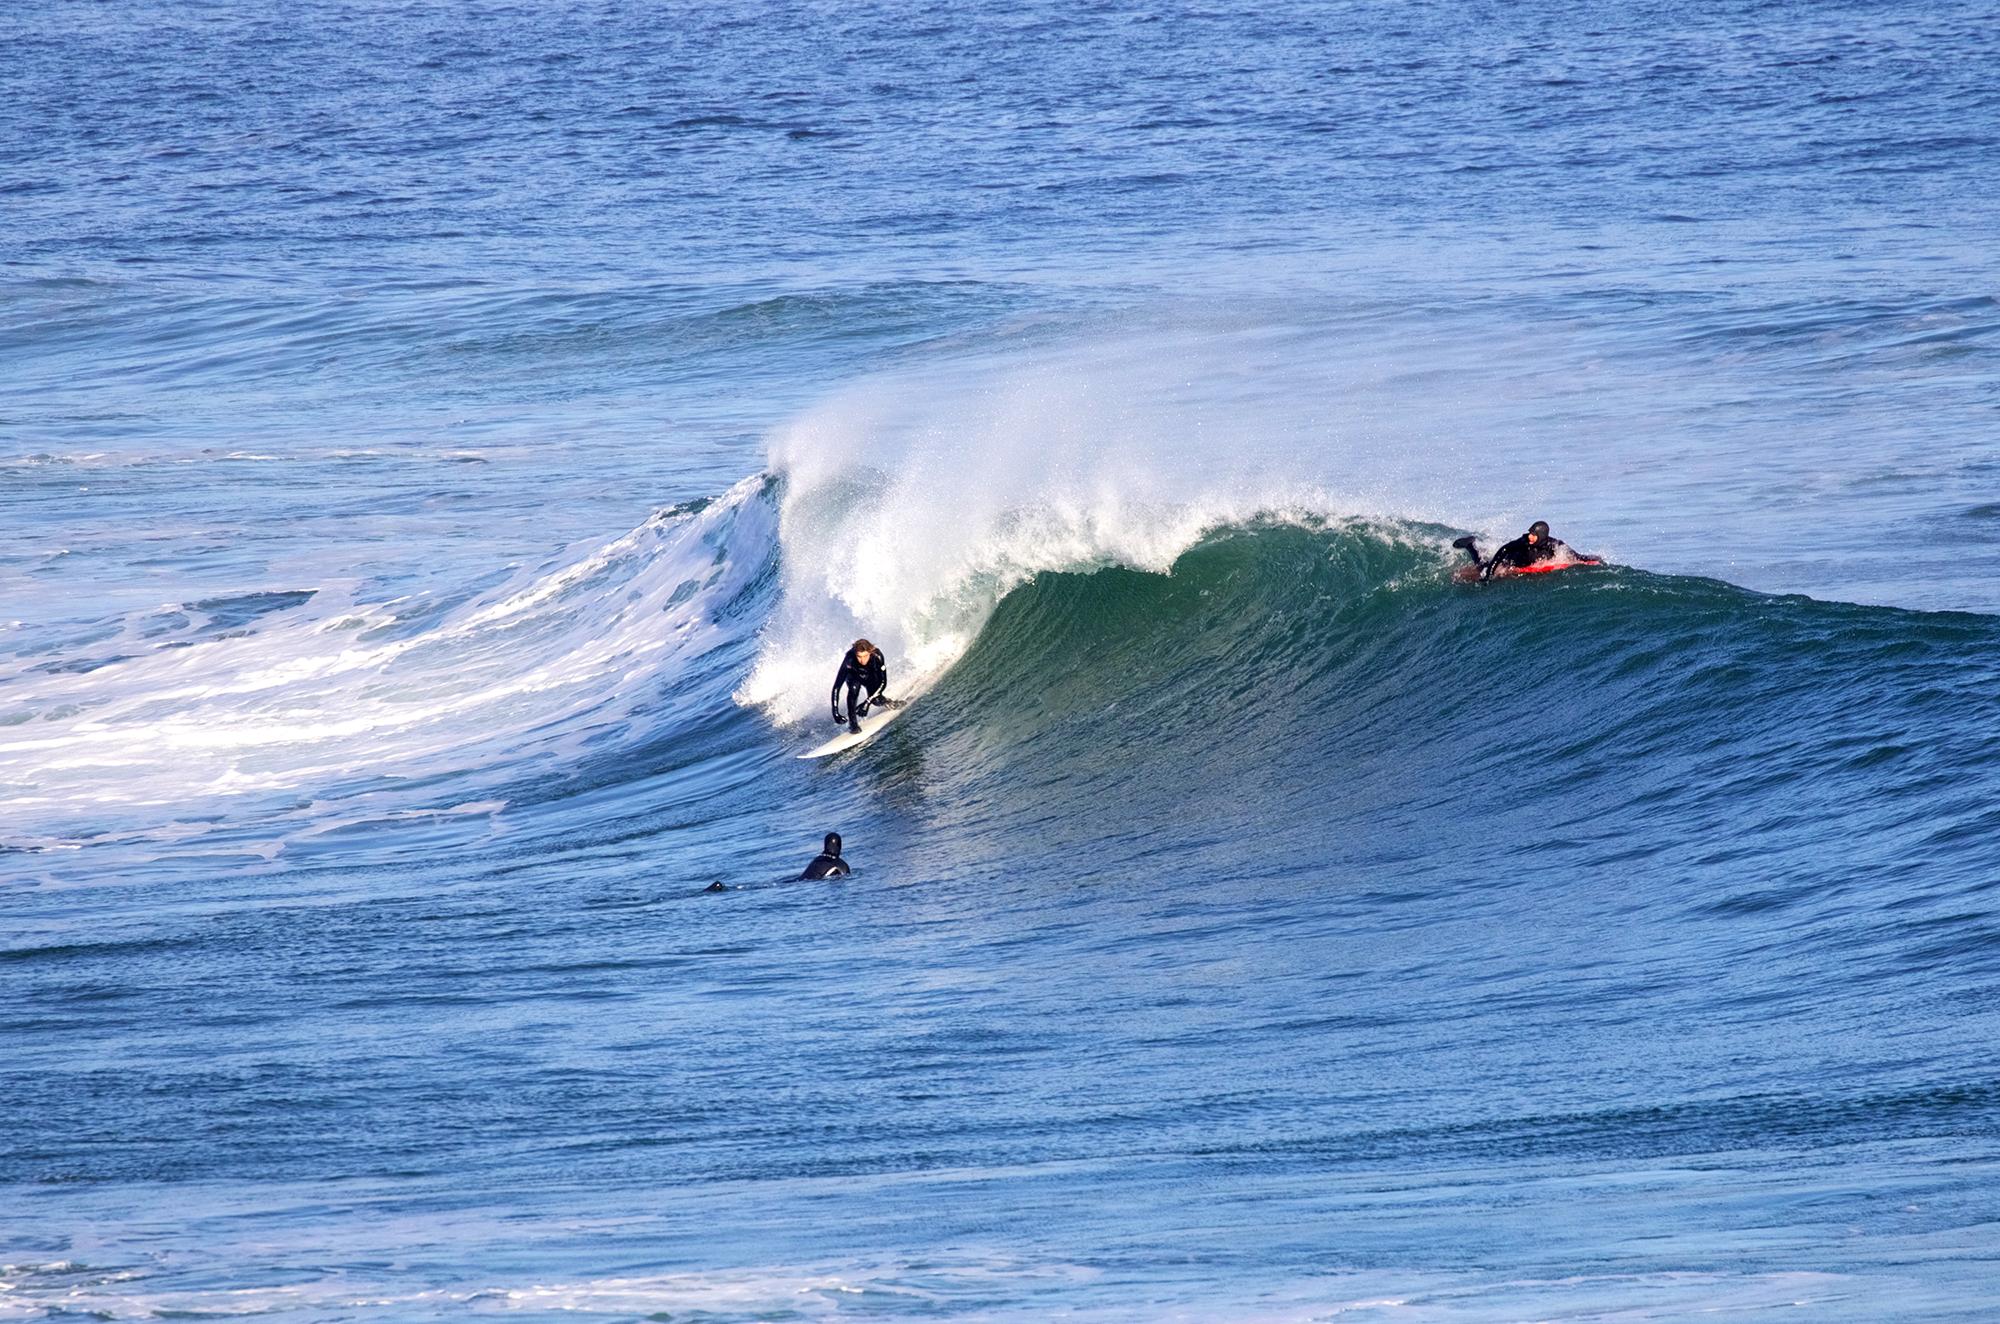 1-19-17 MTK Surfer 20.jpg